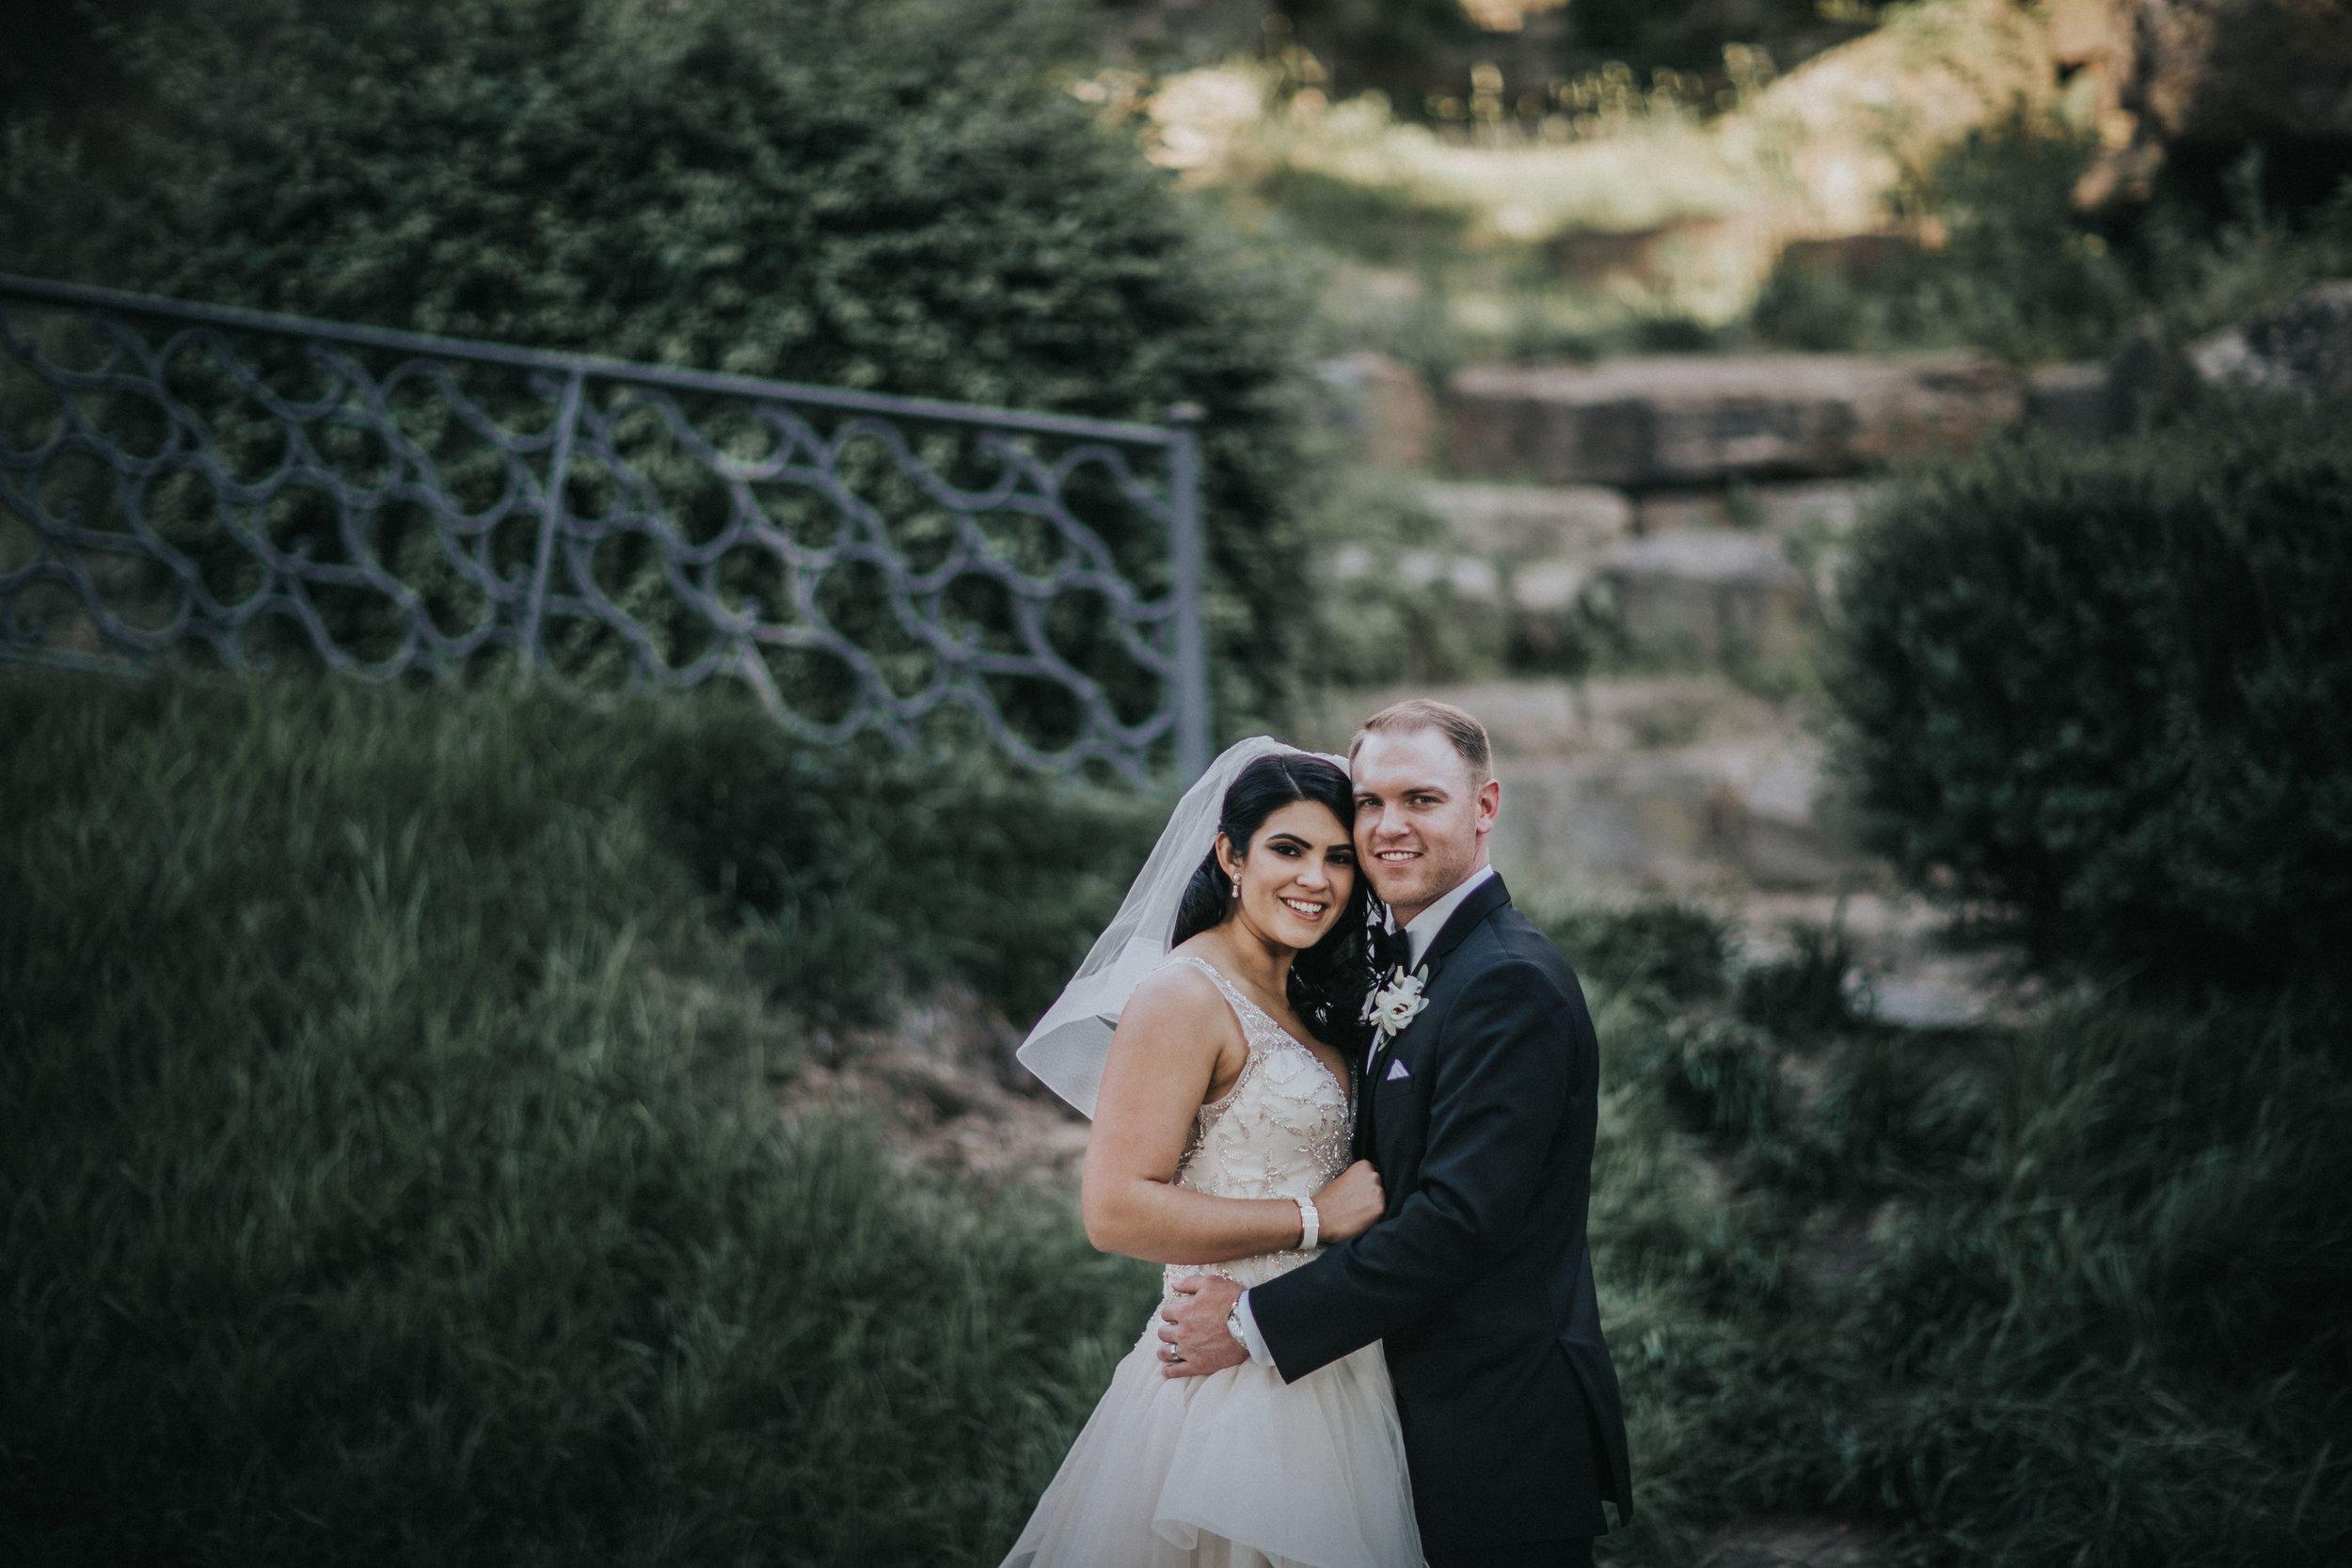 NewJersey_Wedding_Photography_Philadelphia__cescaphe_Waterworks_Bride&Groom-34.jpg